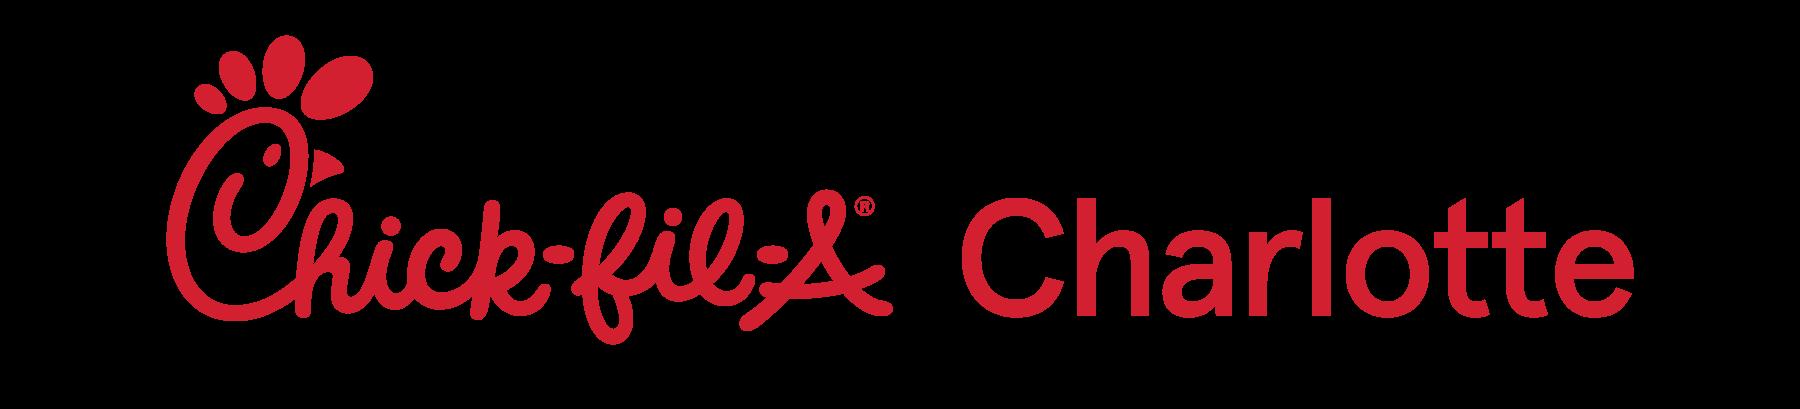 Chick-fil-A Charlotte